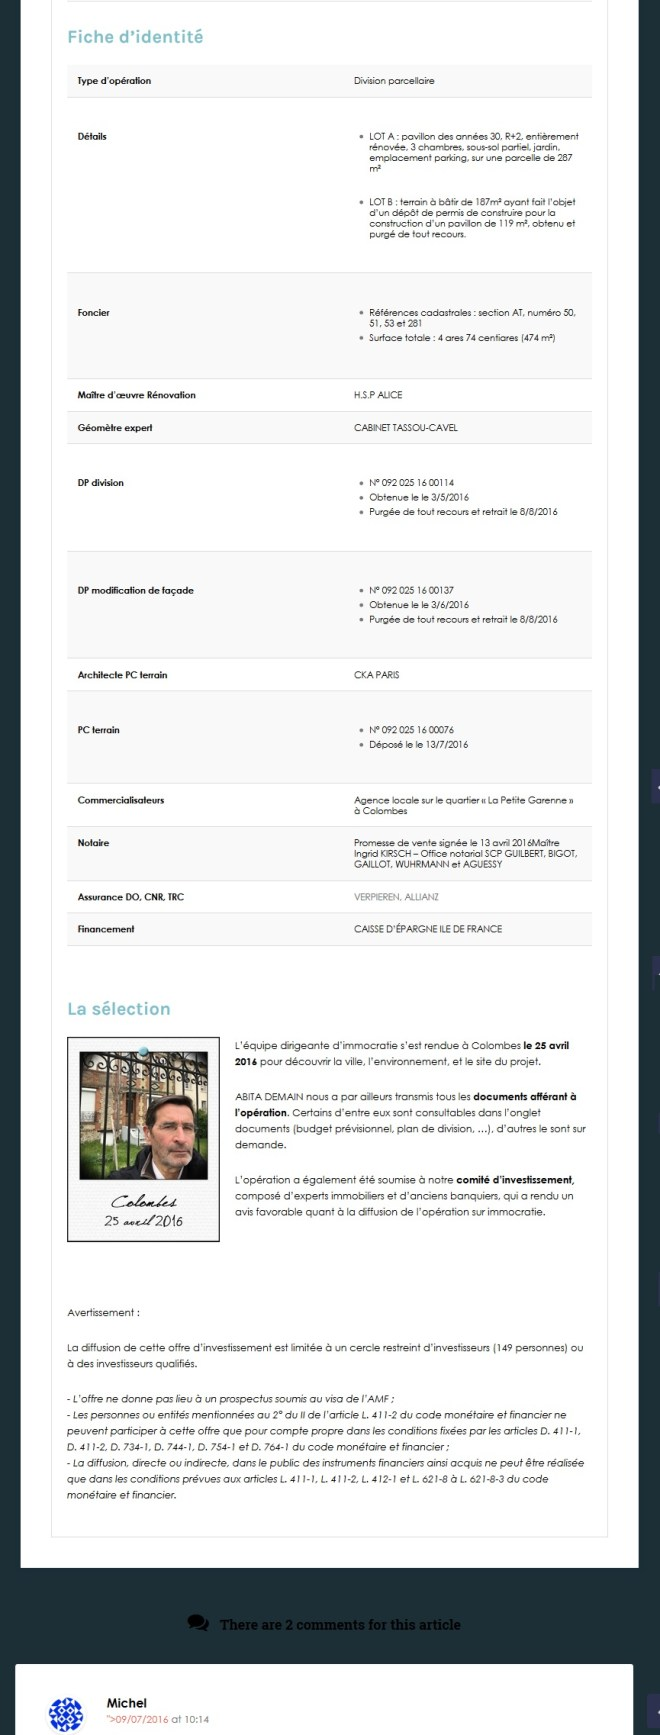 immocratie-crowdfunding-crowdlending-immobilier-projet-04